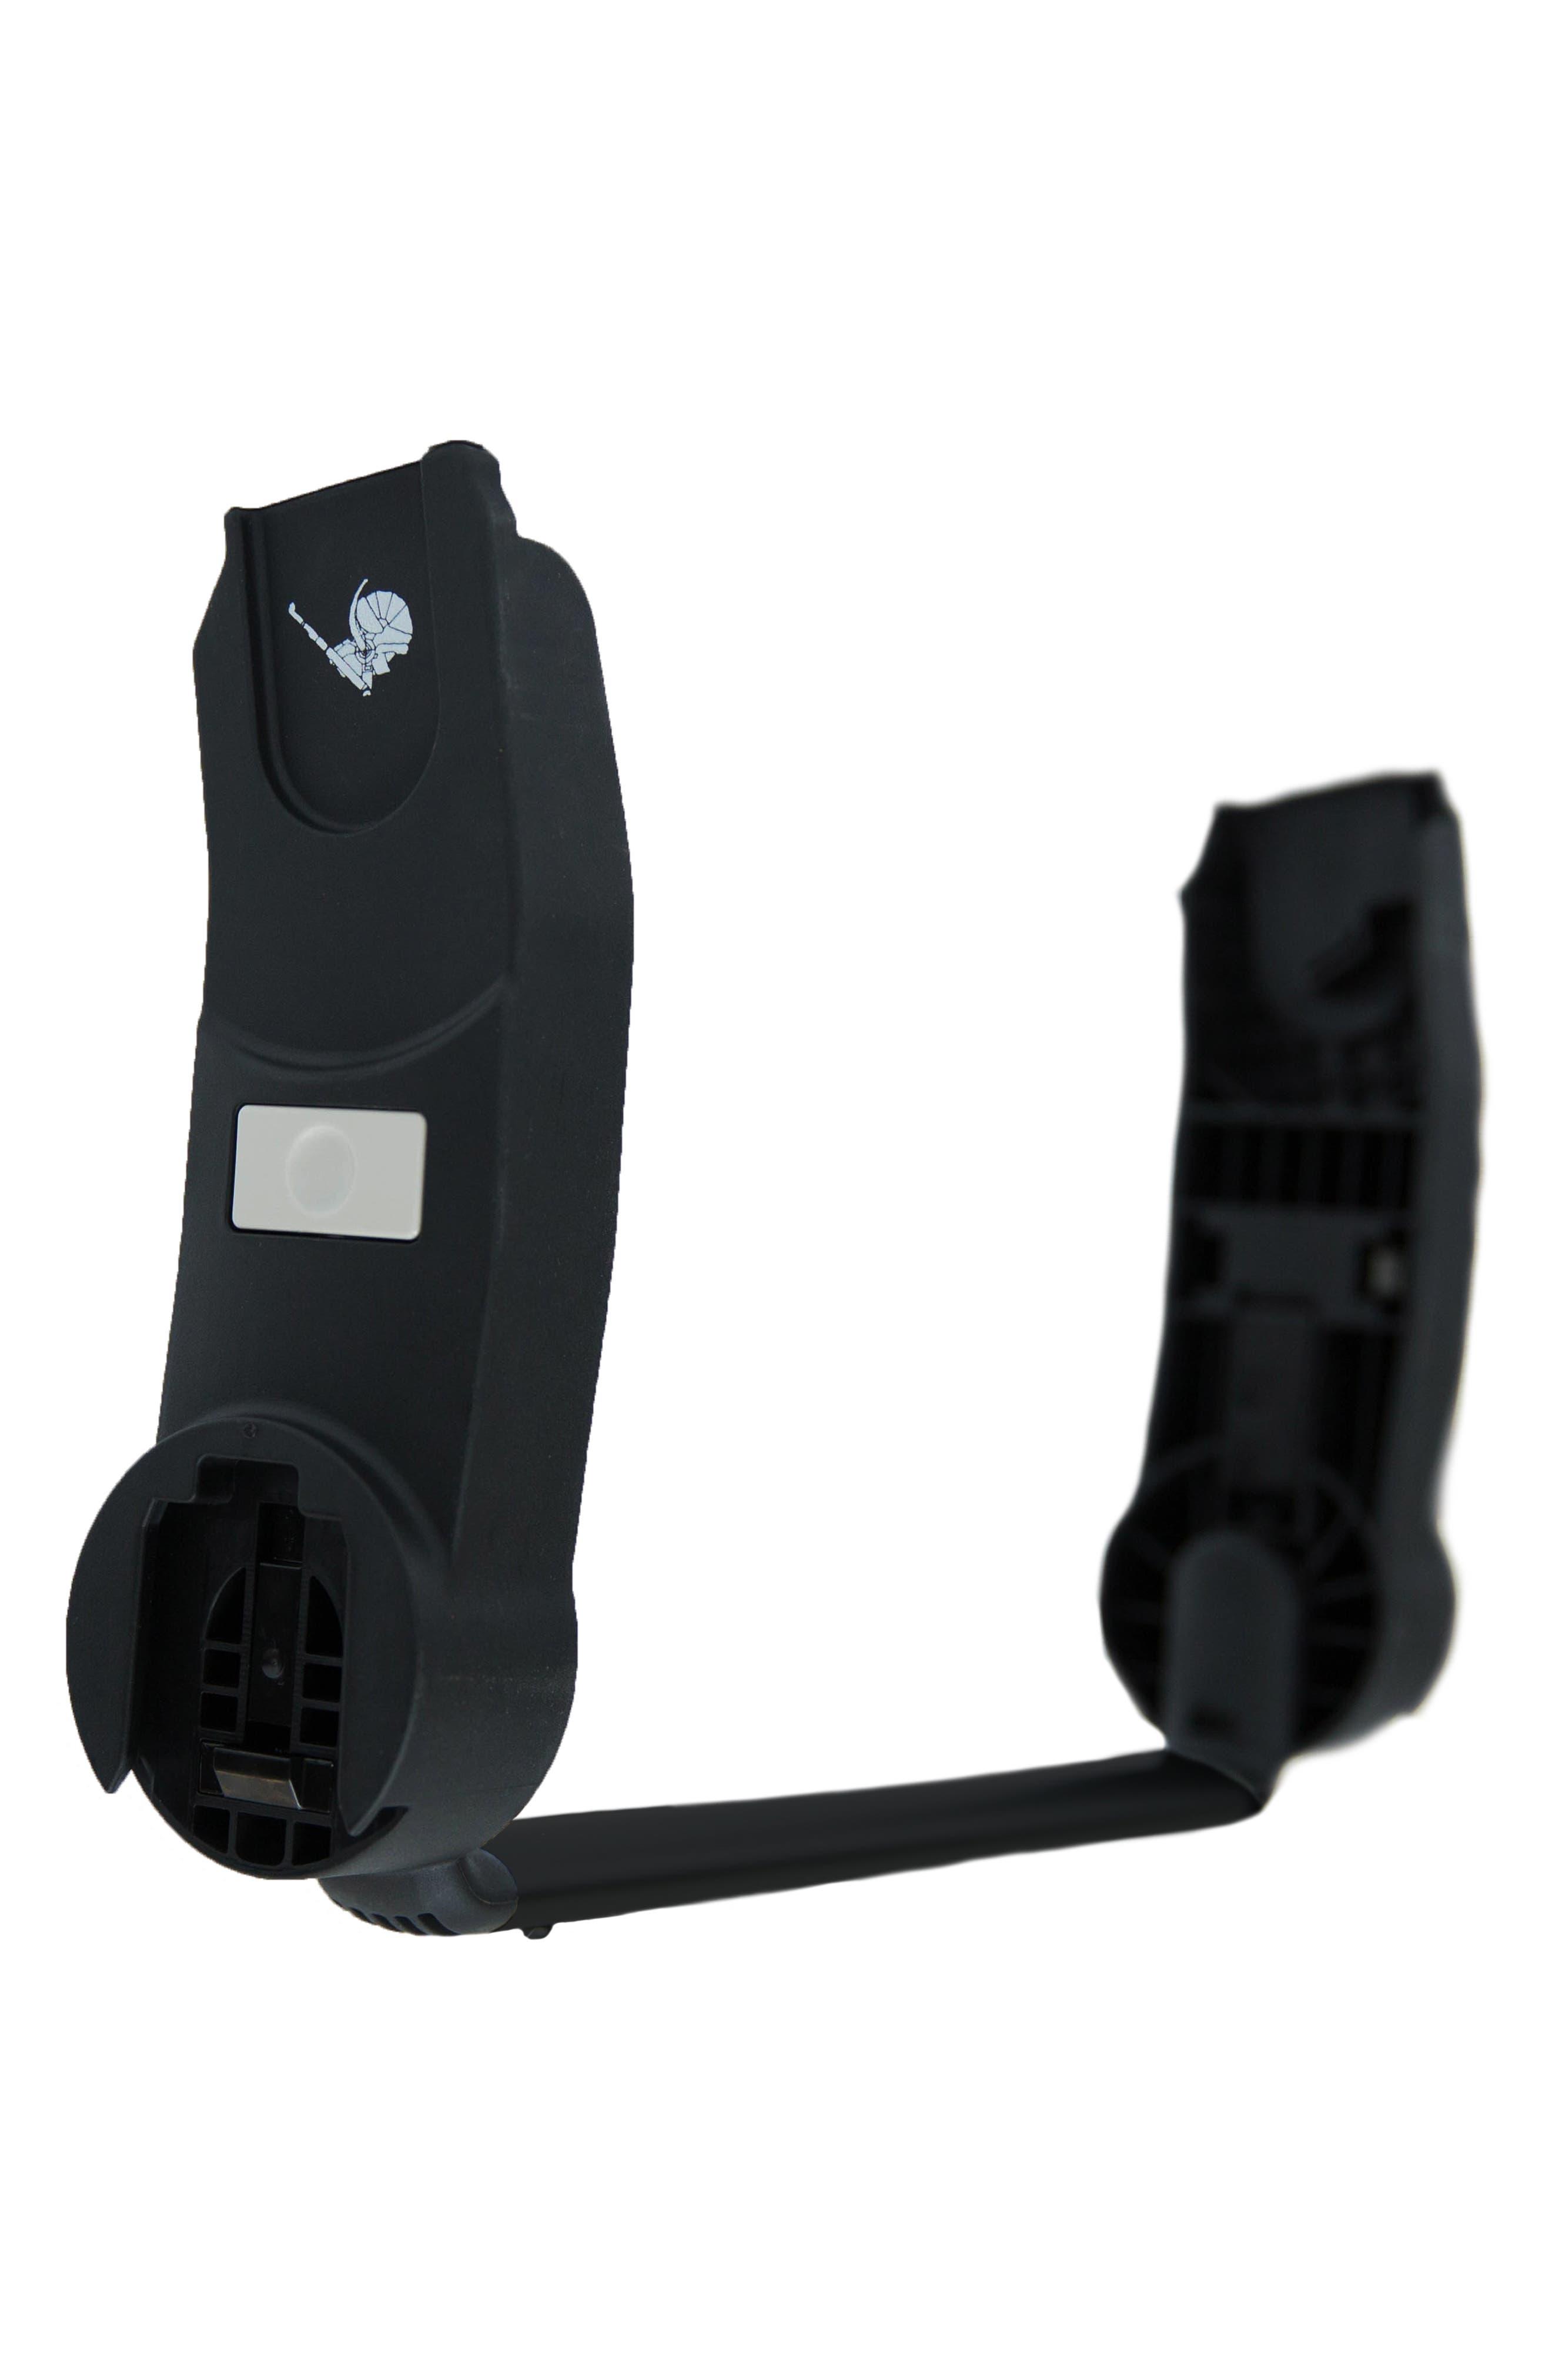 HUB Stroller to Maxi Cosi/Nuna/Aton/Cybex/CabrioFix Infant Car Seat Adapter,                             Main thumbnail 1, color,                             BLACK